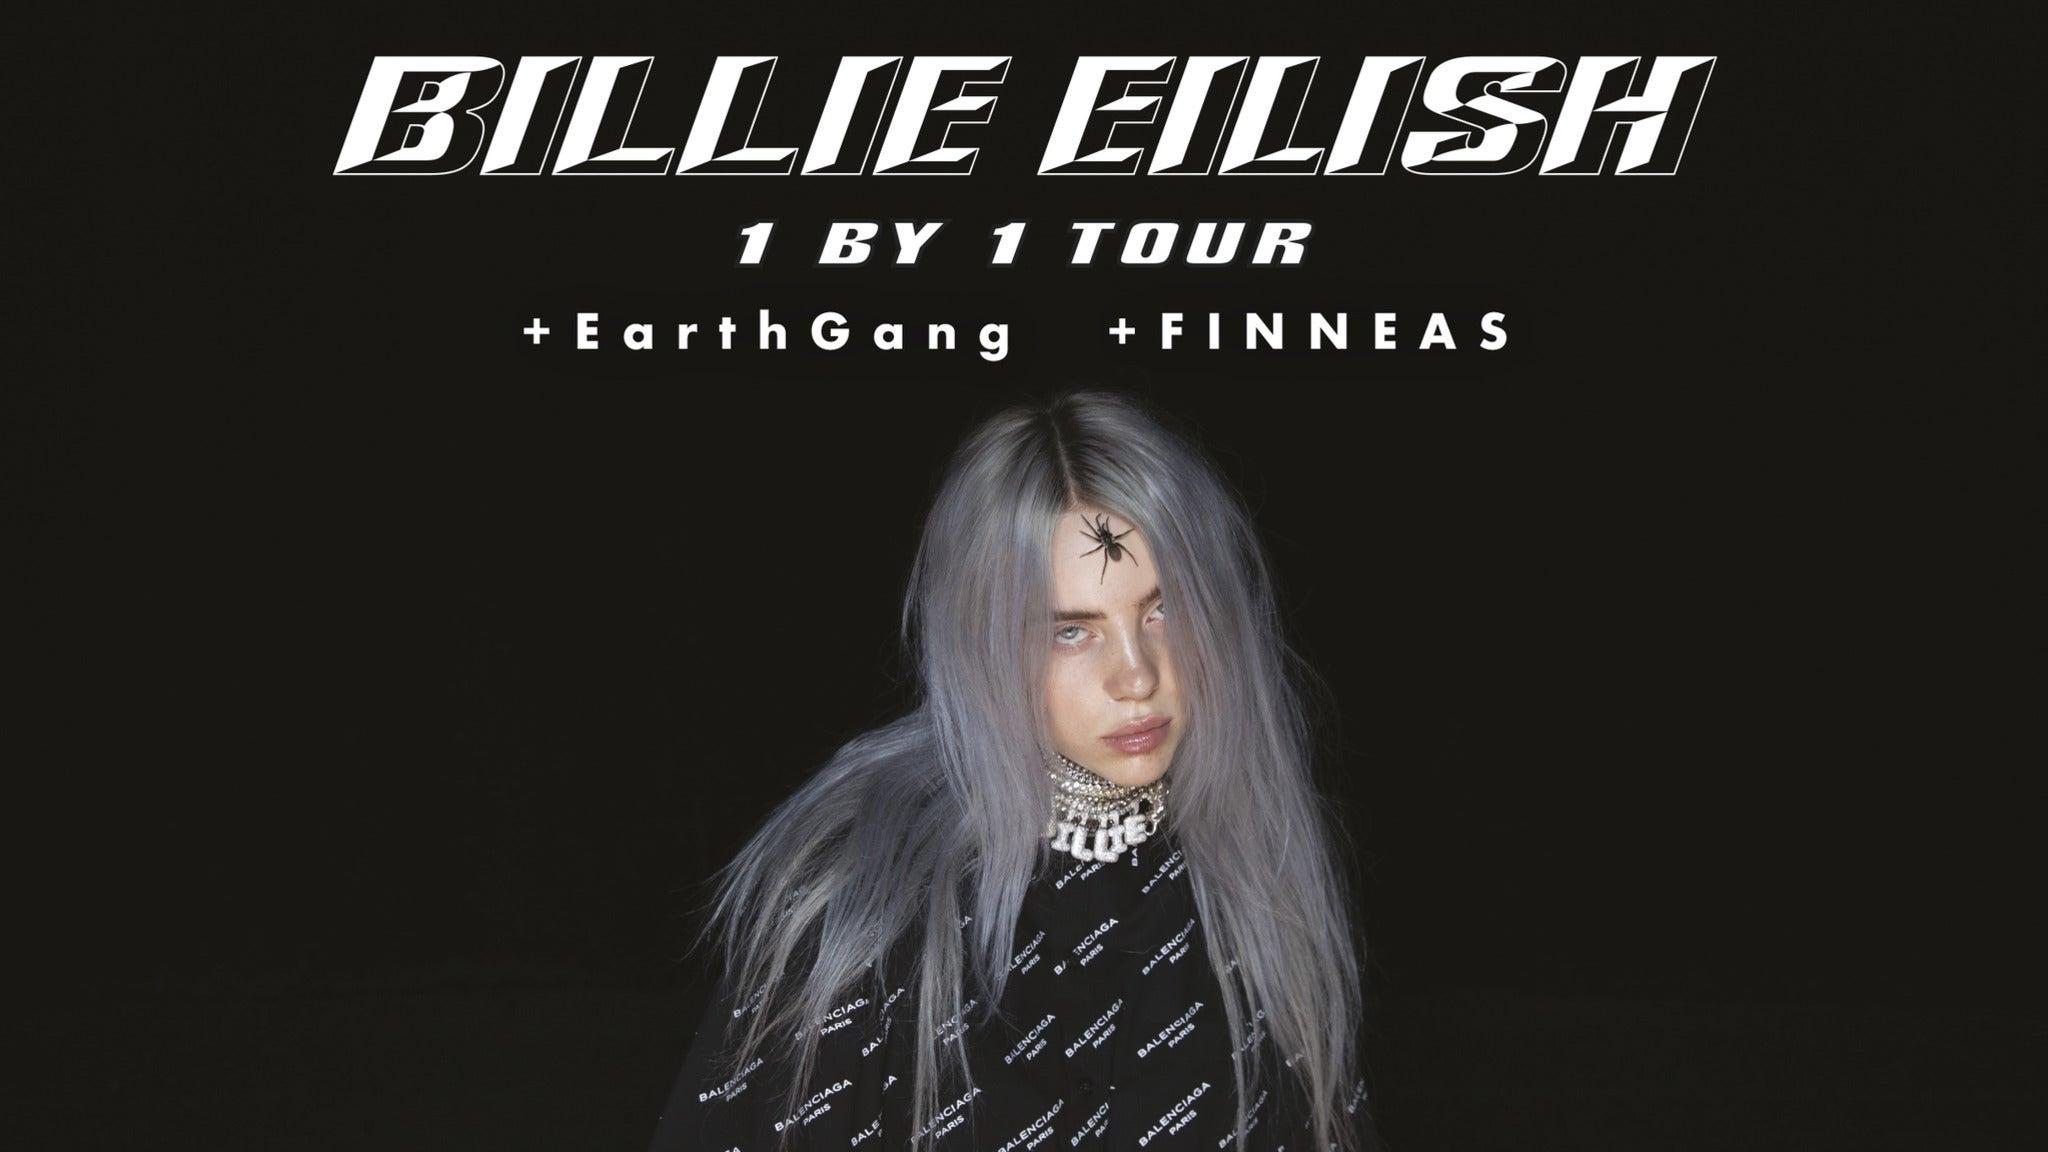 Billie Eilish at The Fonda Theatre